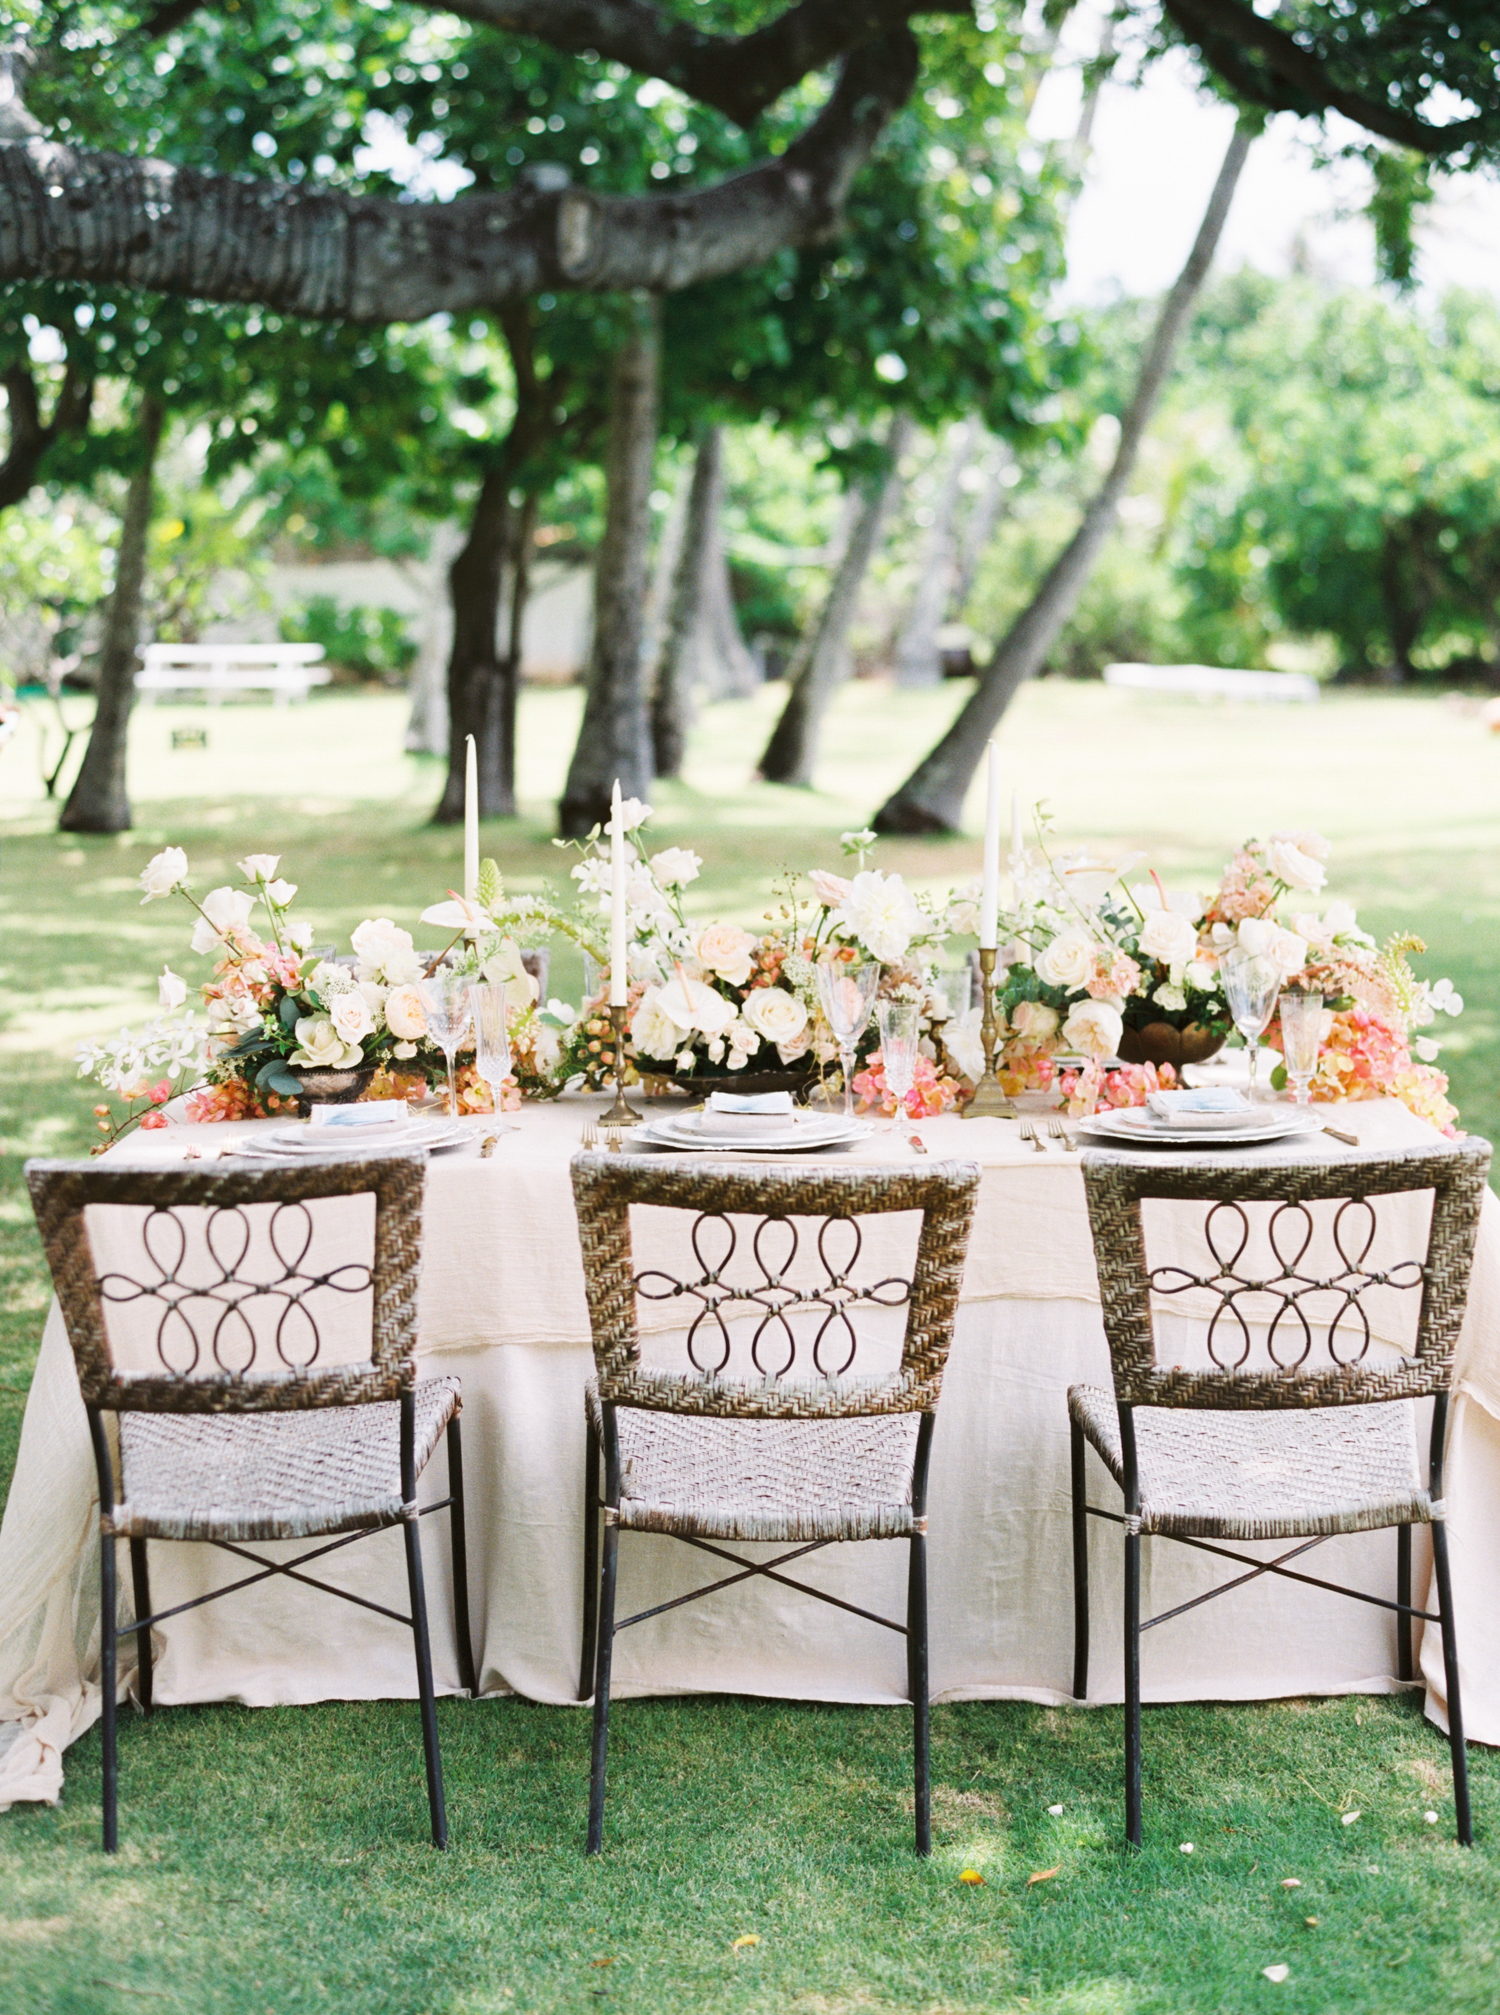 Wedding table setting in tropical Hawaii for a destination wedding